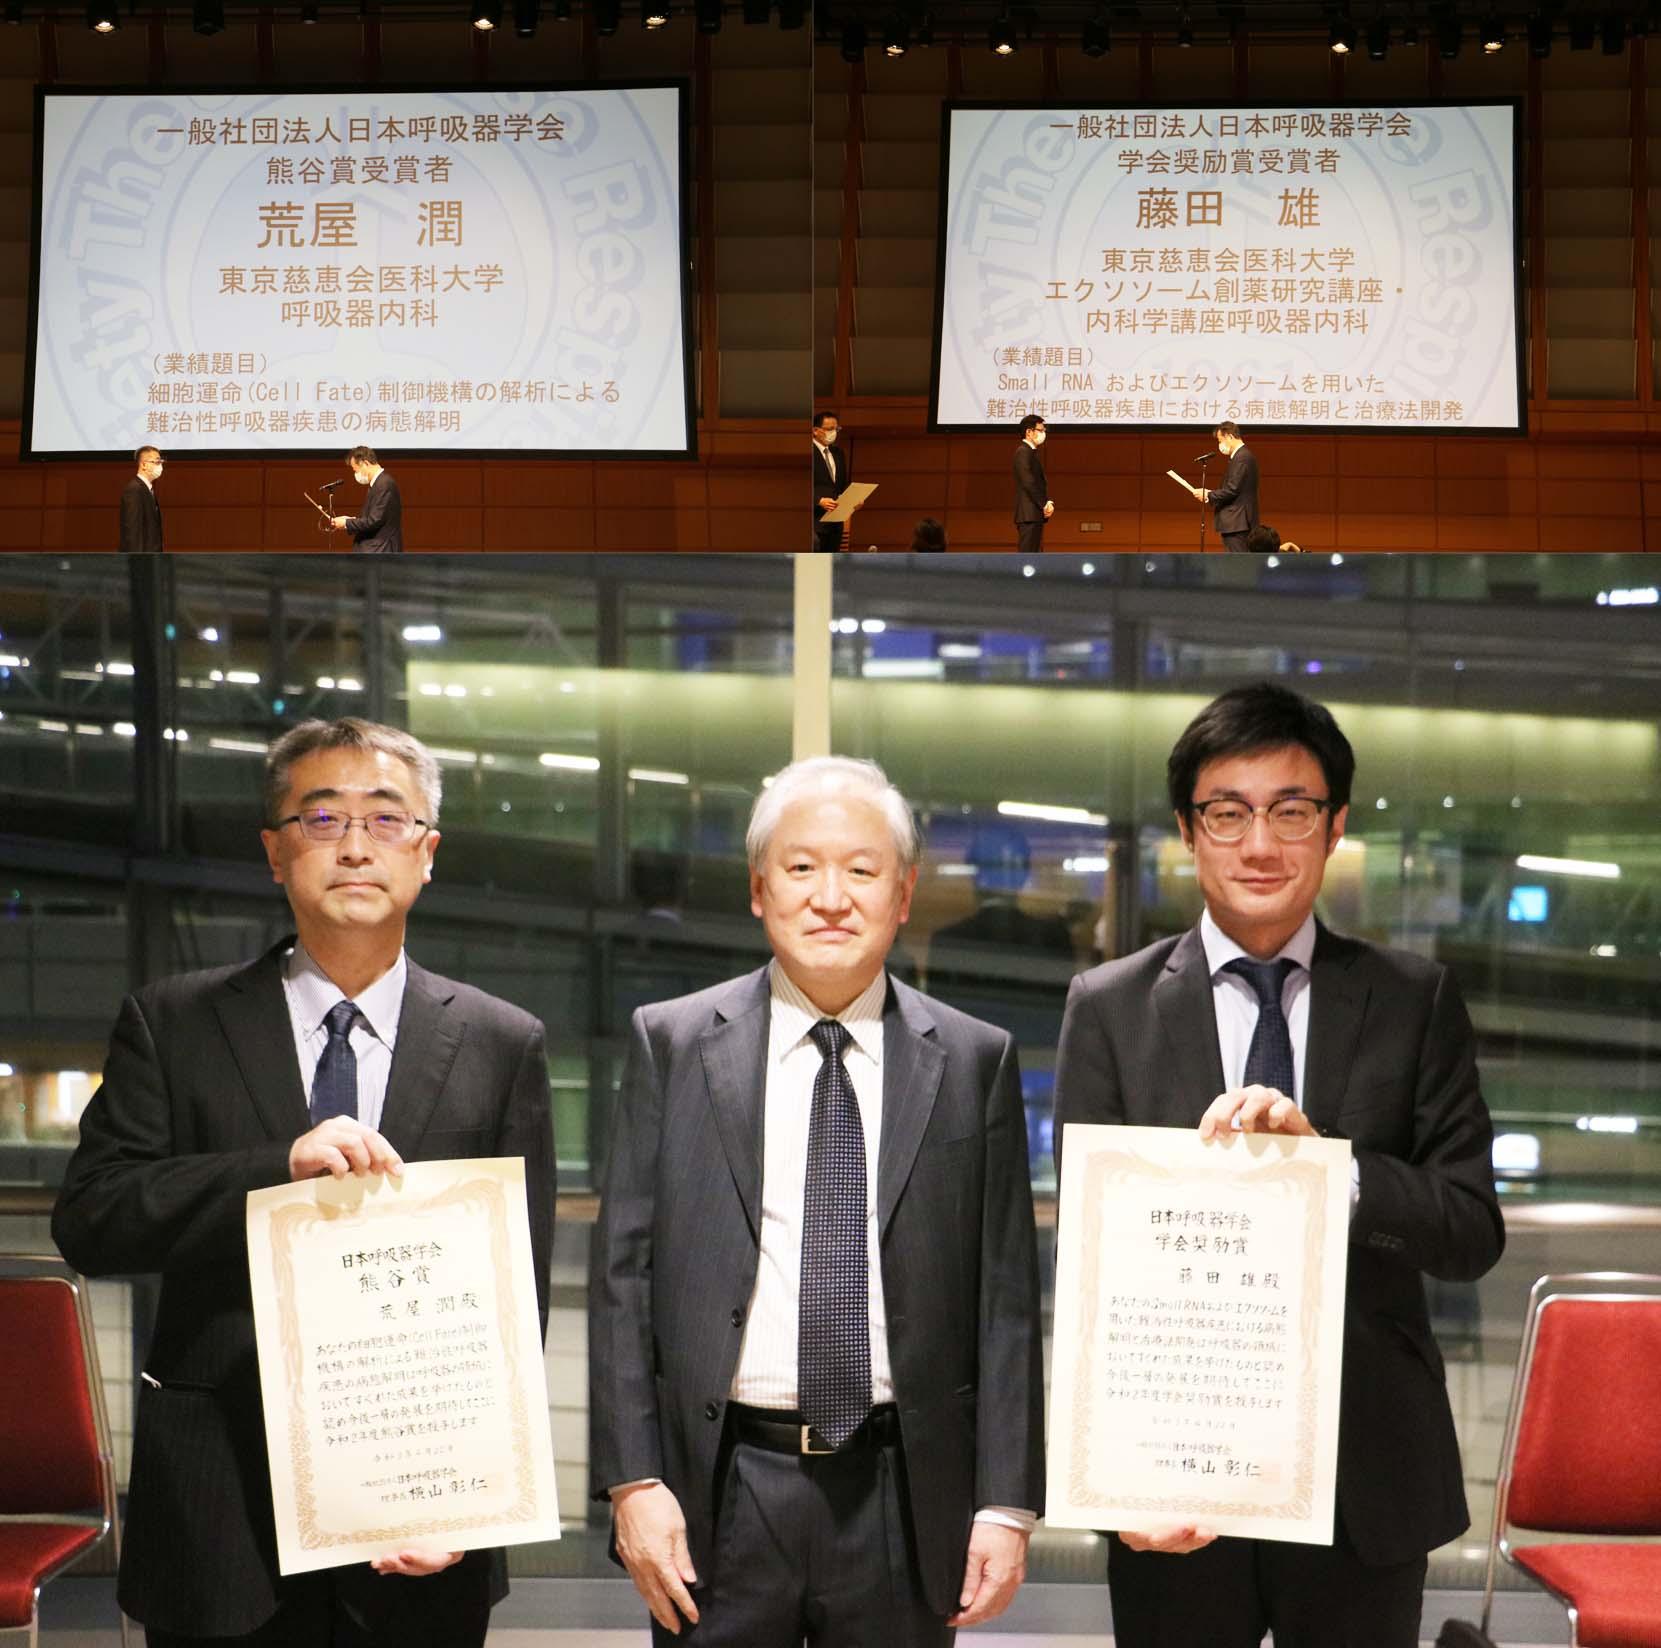 呼吸器学会にて荒屋先生が熊谷賞、藤田先生が学会奨励賞をW受賞!